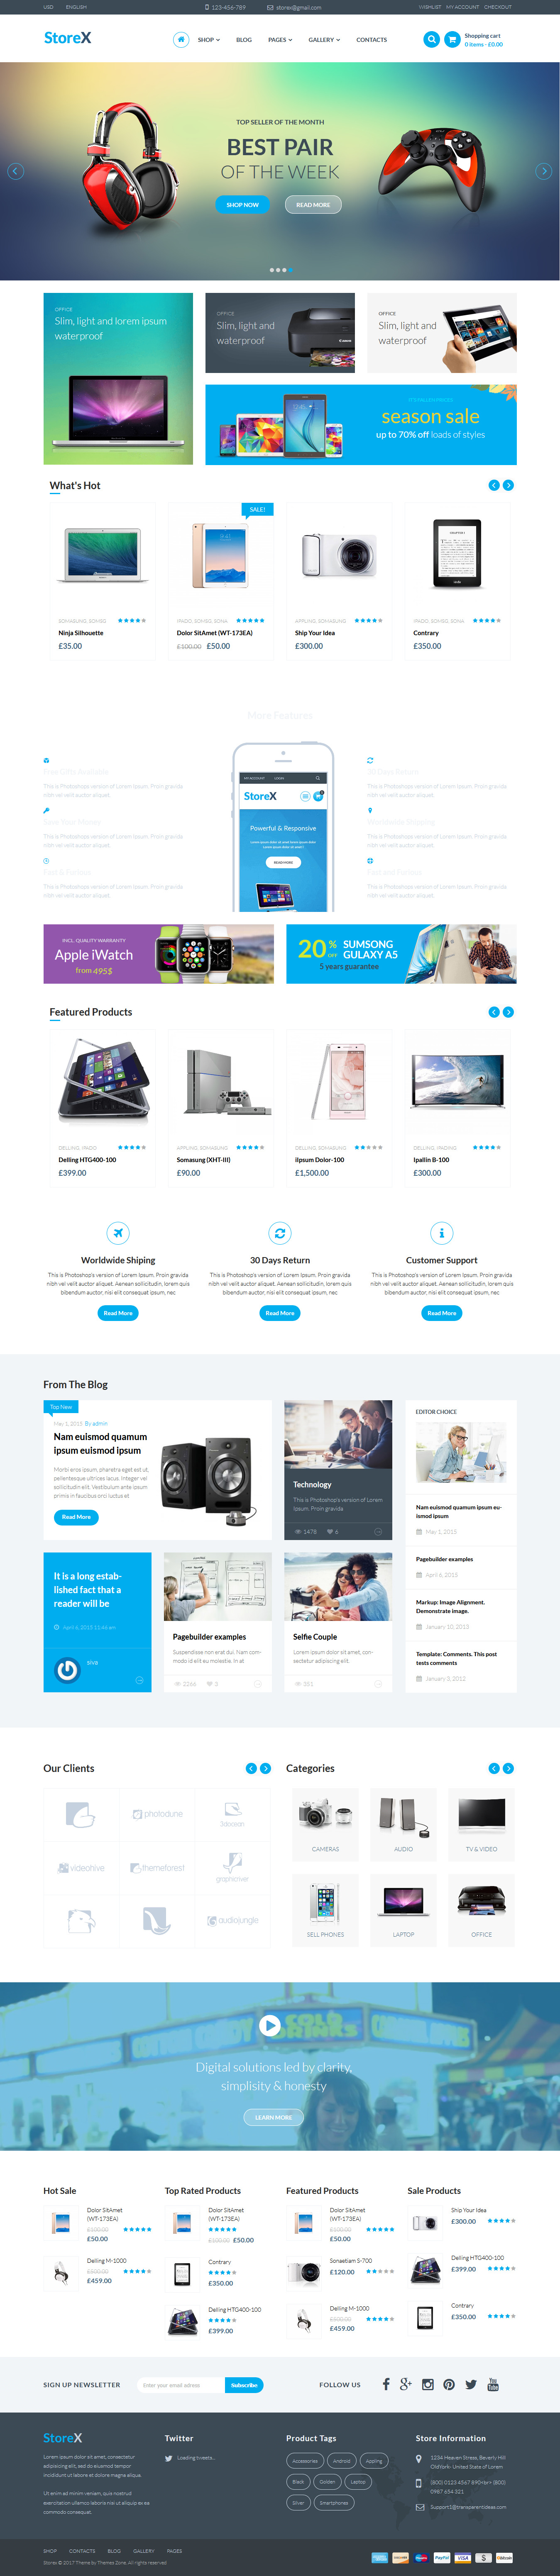 StoreX - Best Premium Drag and Drop WordPress Theme